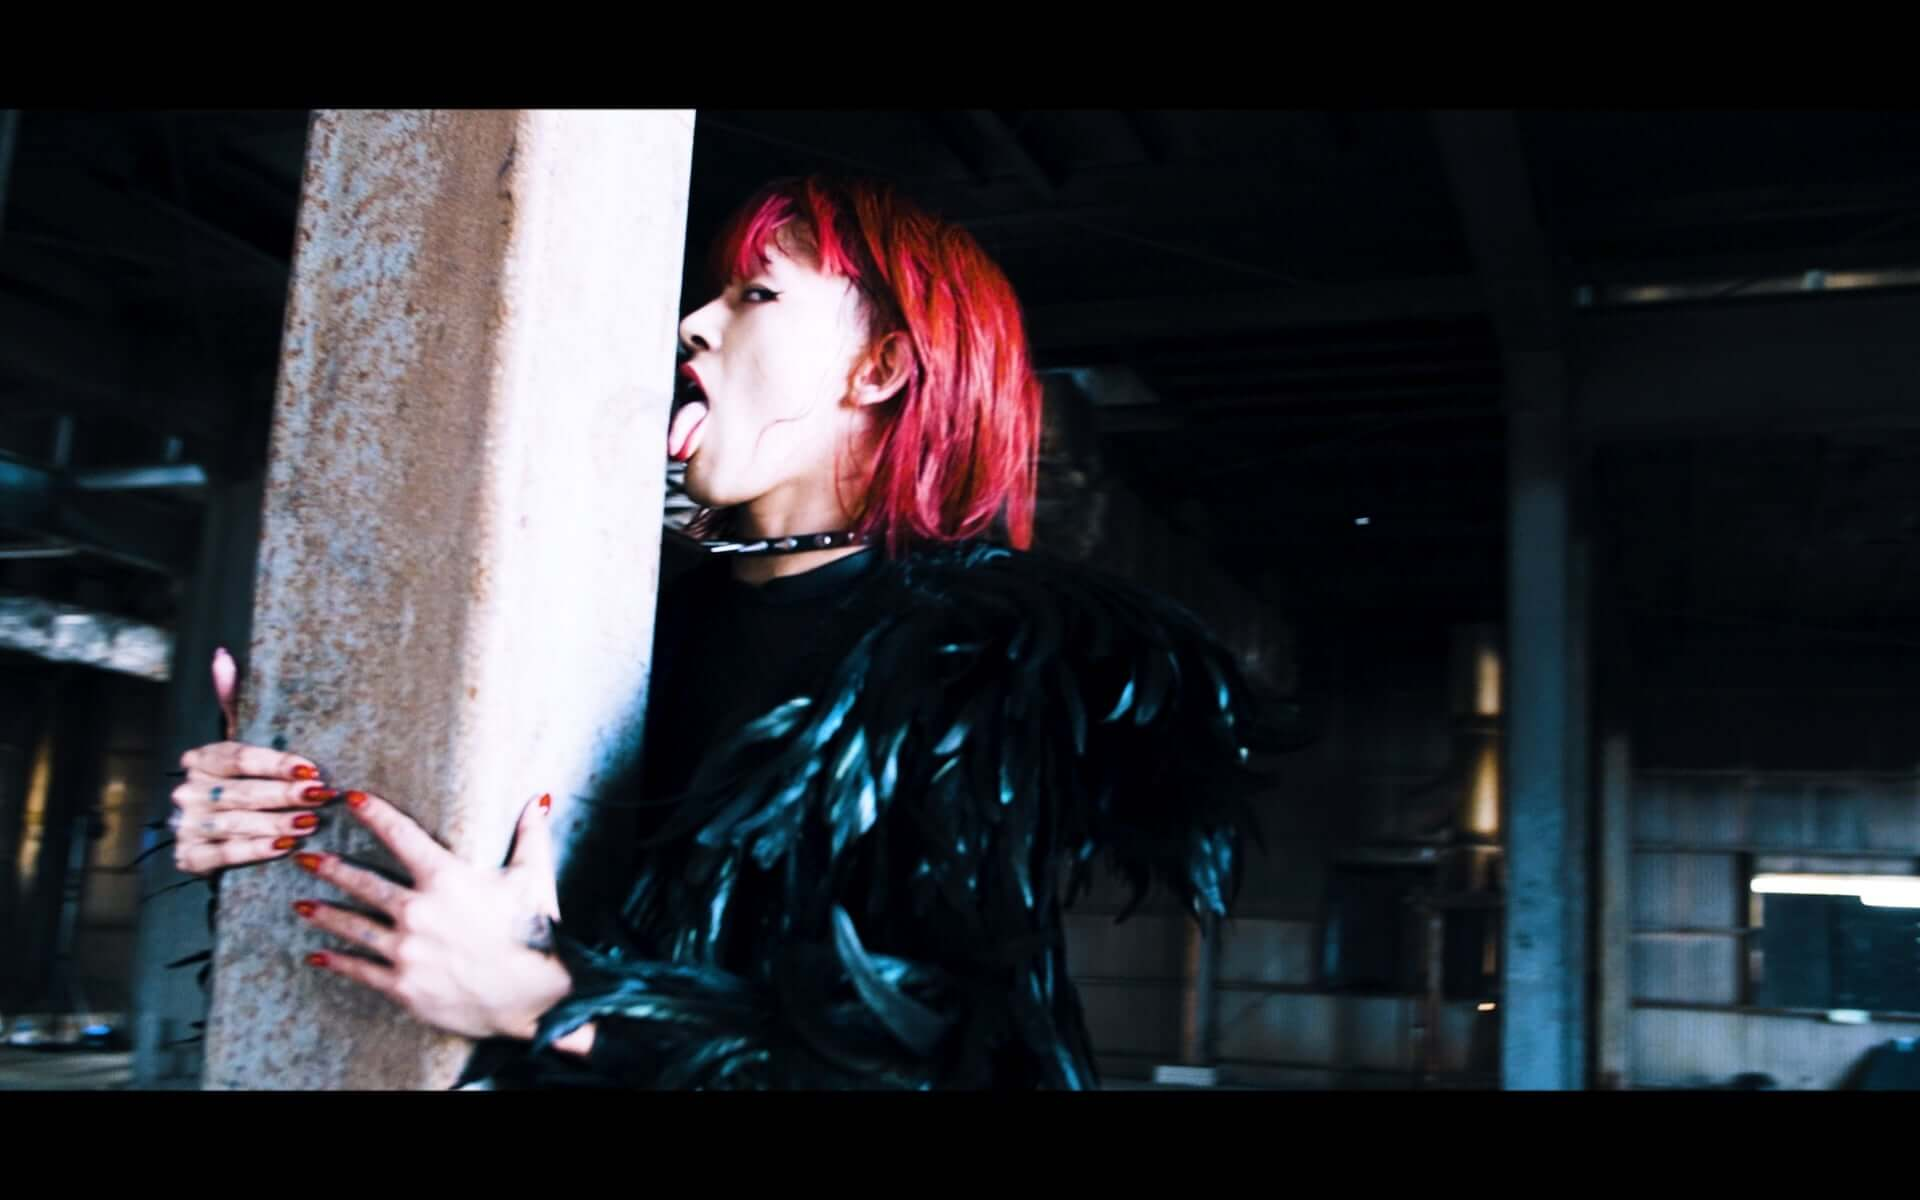 "gatoの最新シングル""dada""が配信開始&MVも公開!バンド初のフルアルバム『BAECUL』もリリース決定 music200903_gato_9-1920x1200"